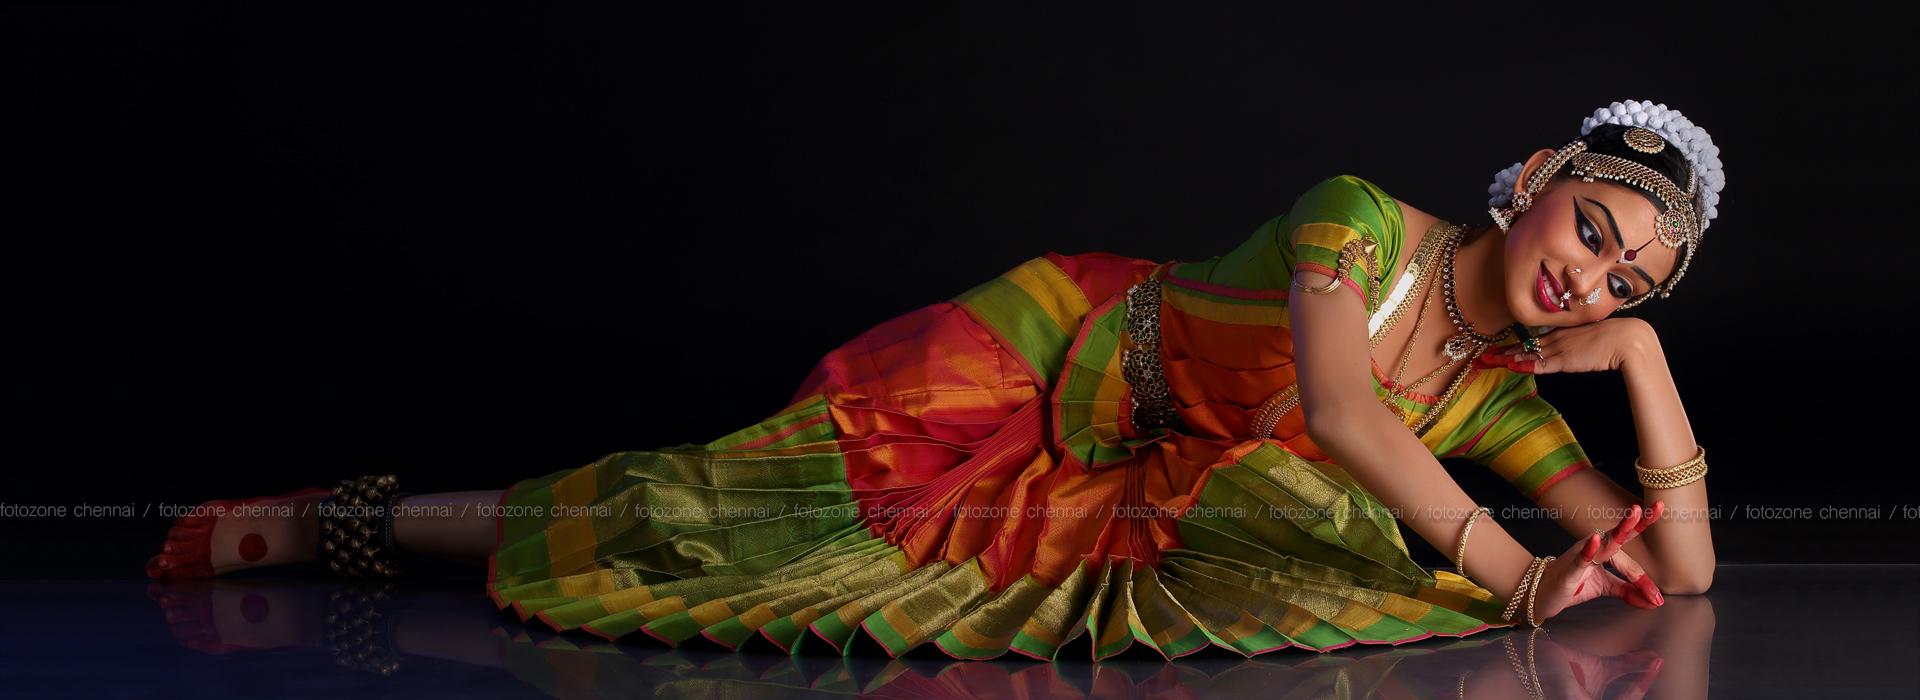 bharatanatyam professional photography